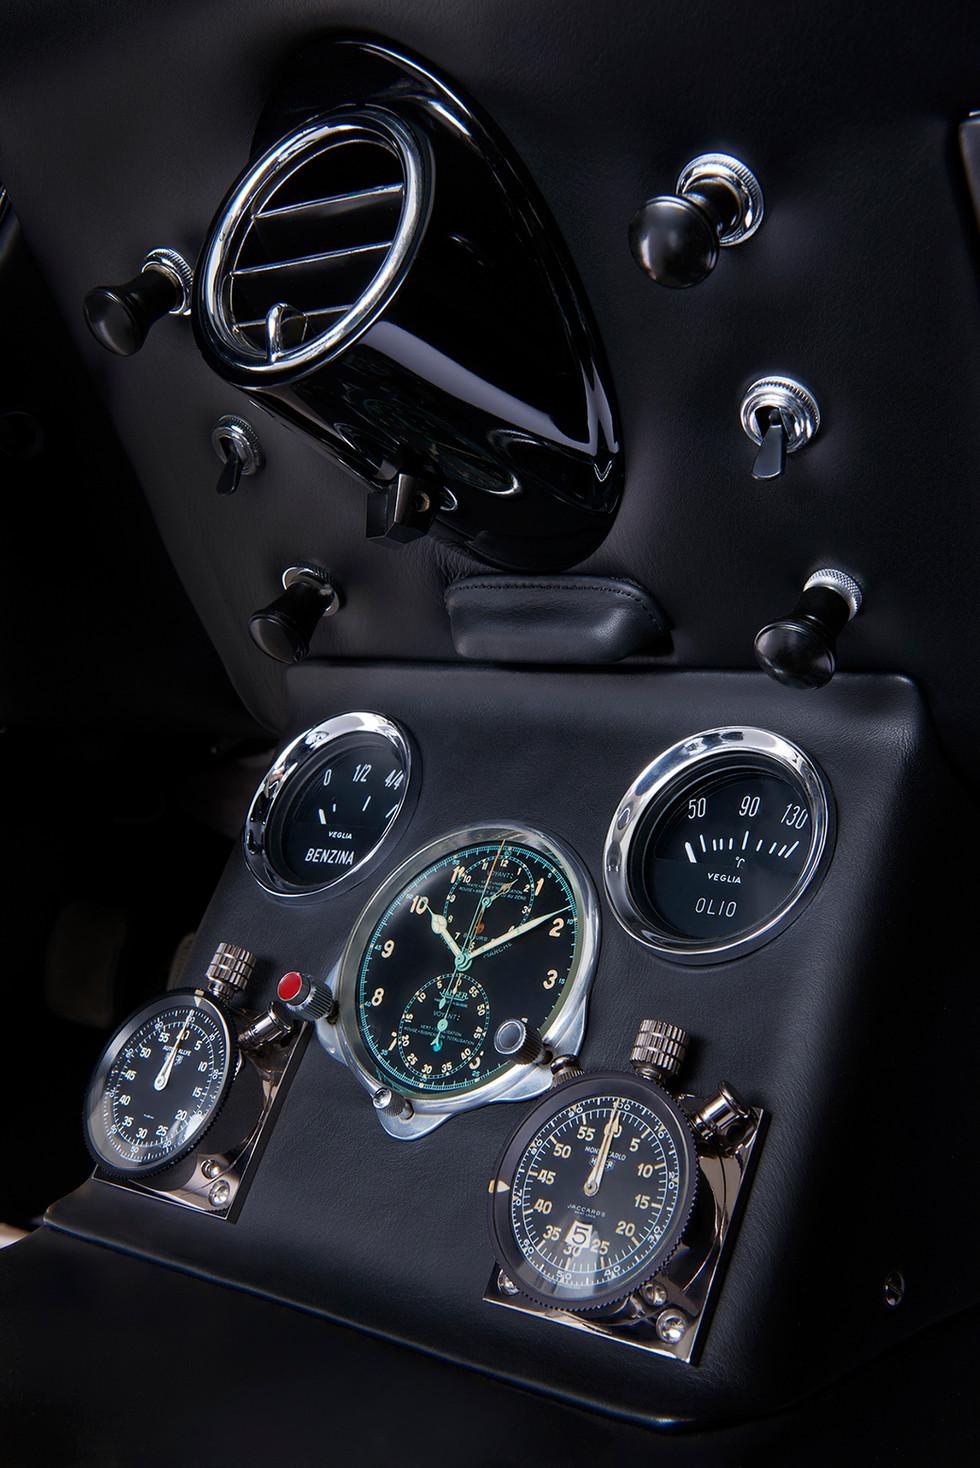 1959 Ferrari 400 Superamerica Coupé Speciale